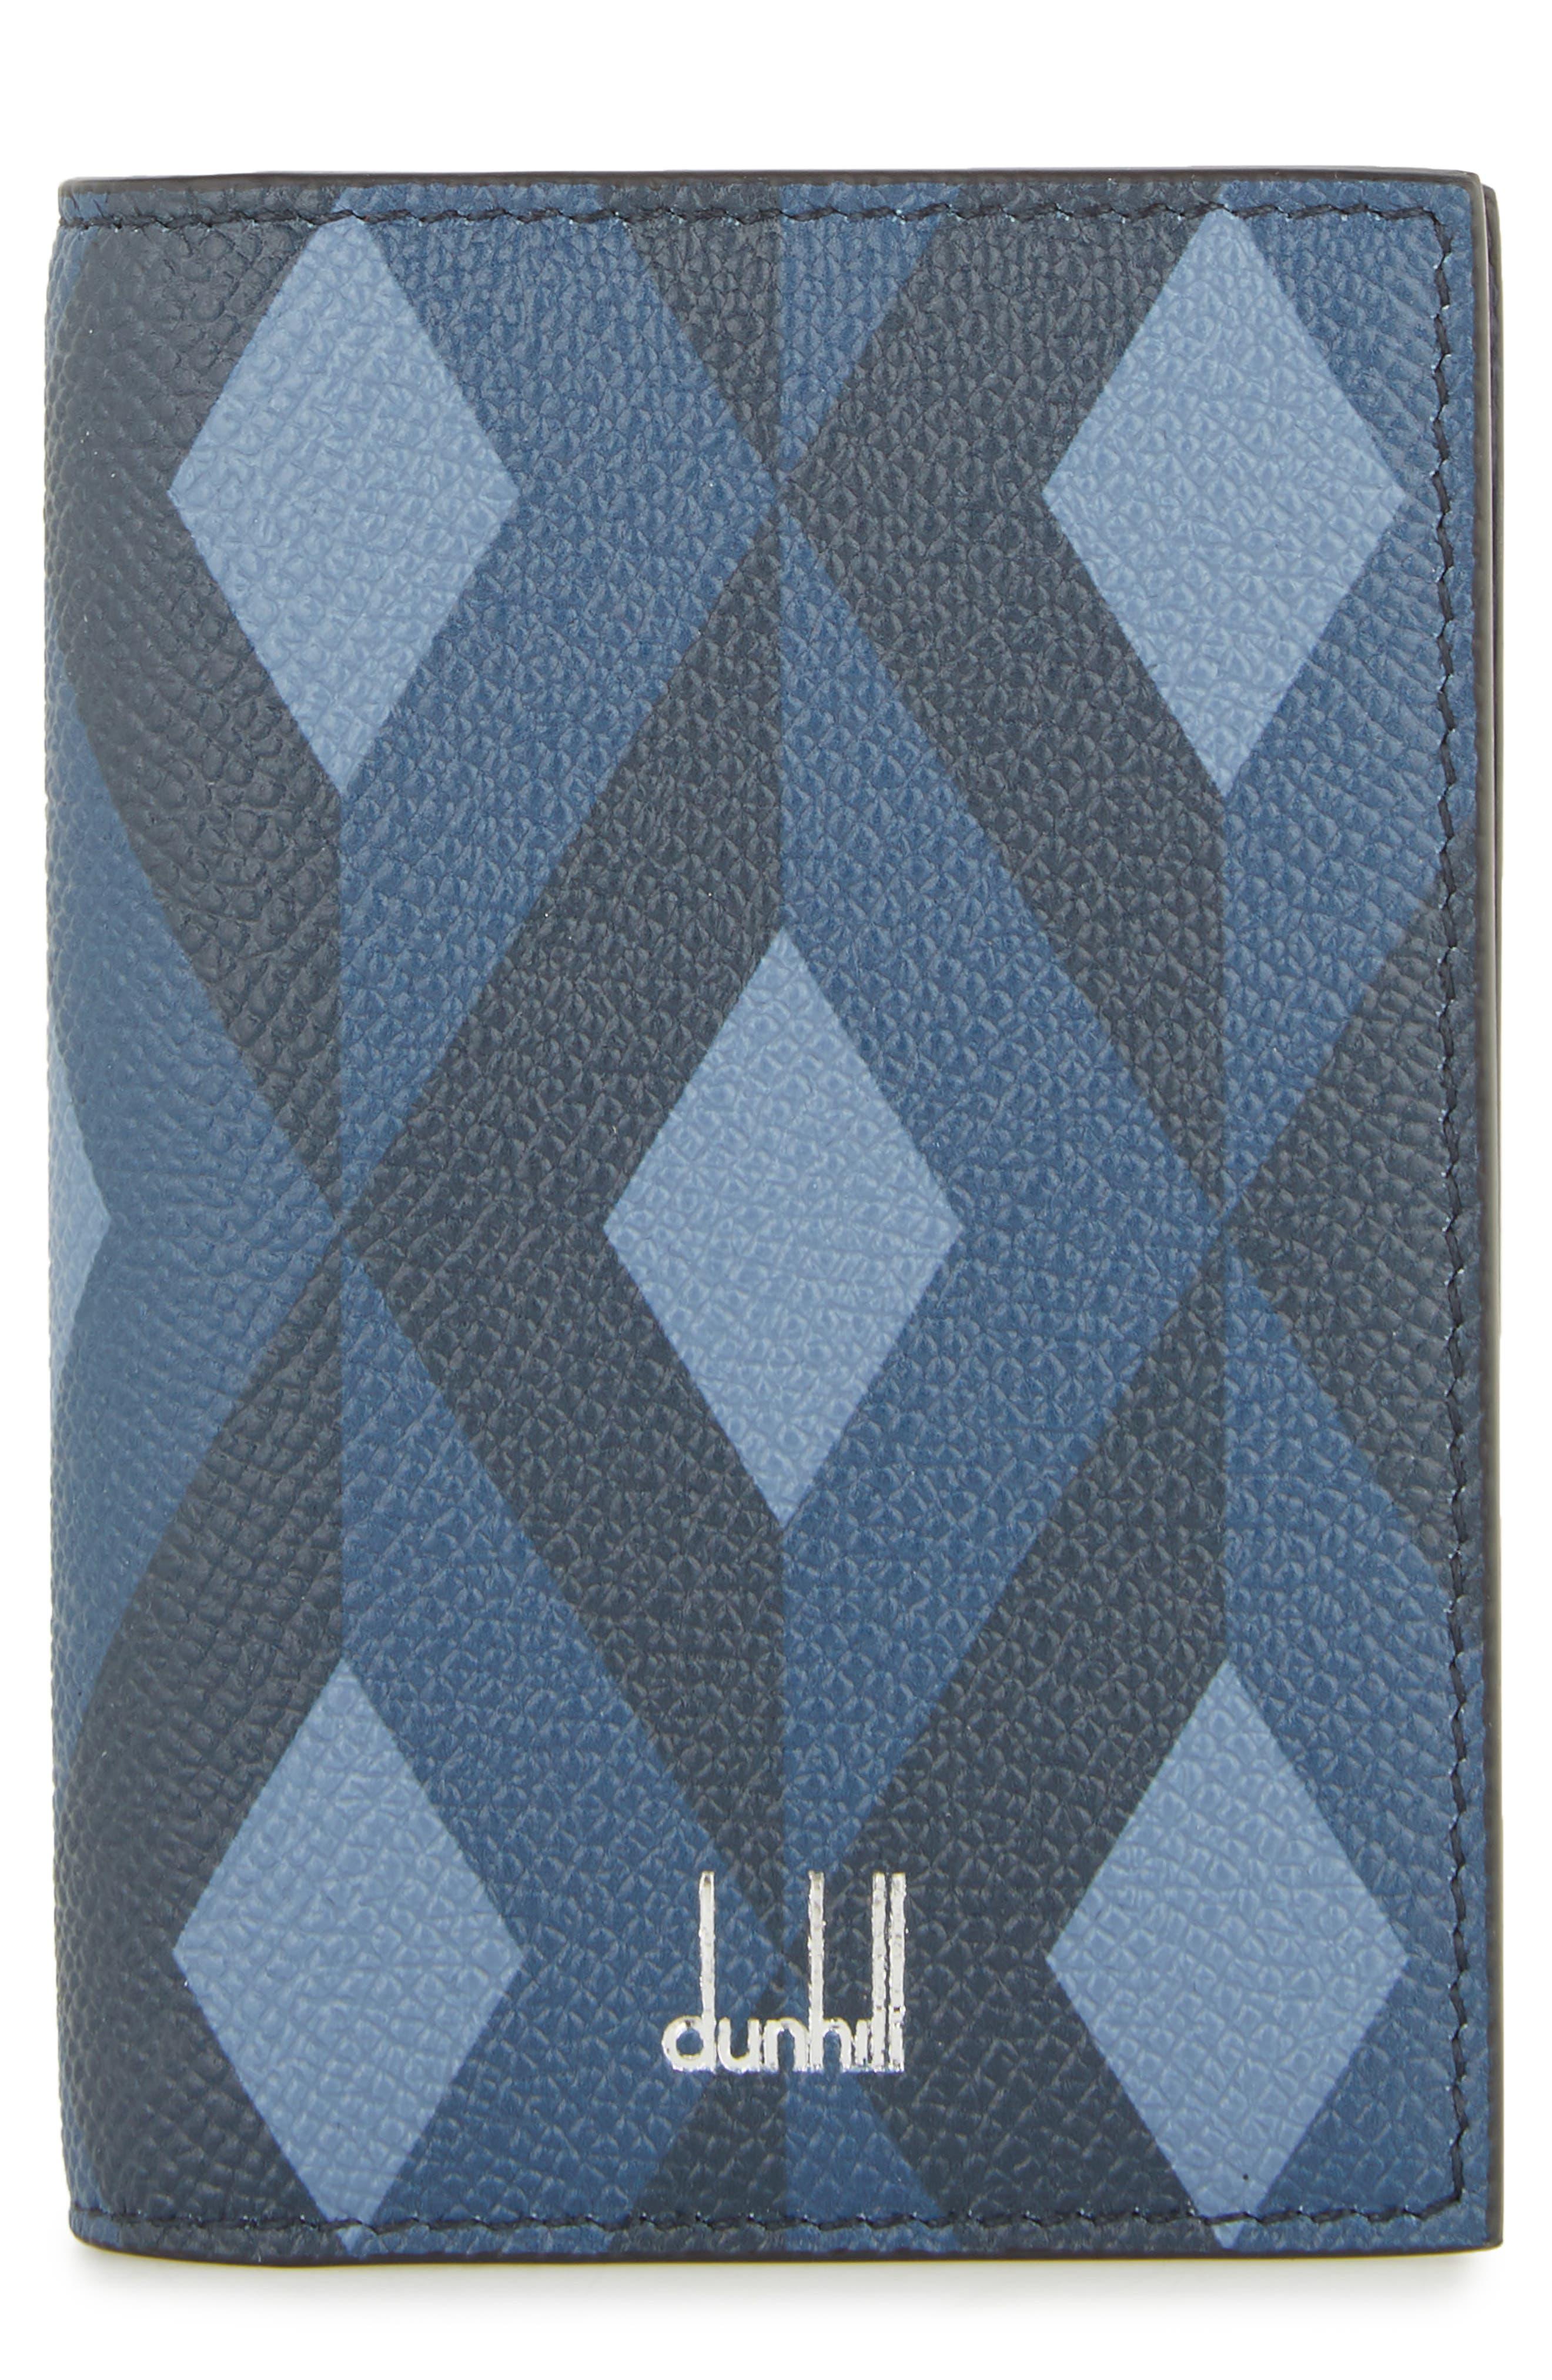 Cadogan Leather Business Card Case,                         Main,                         color, BLUE